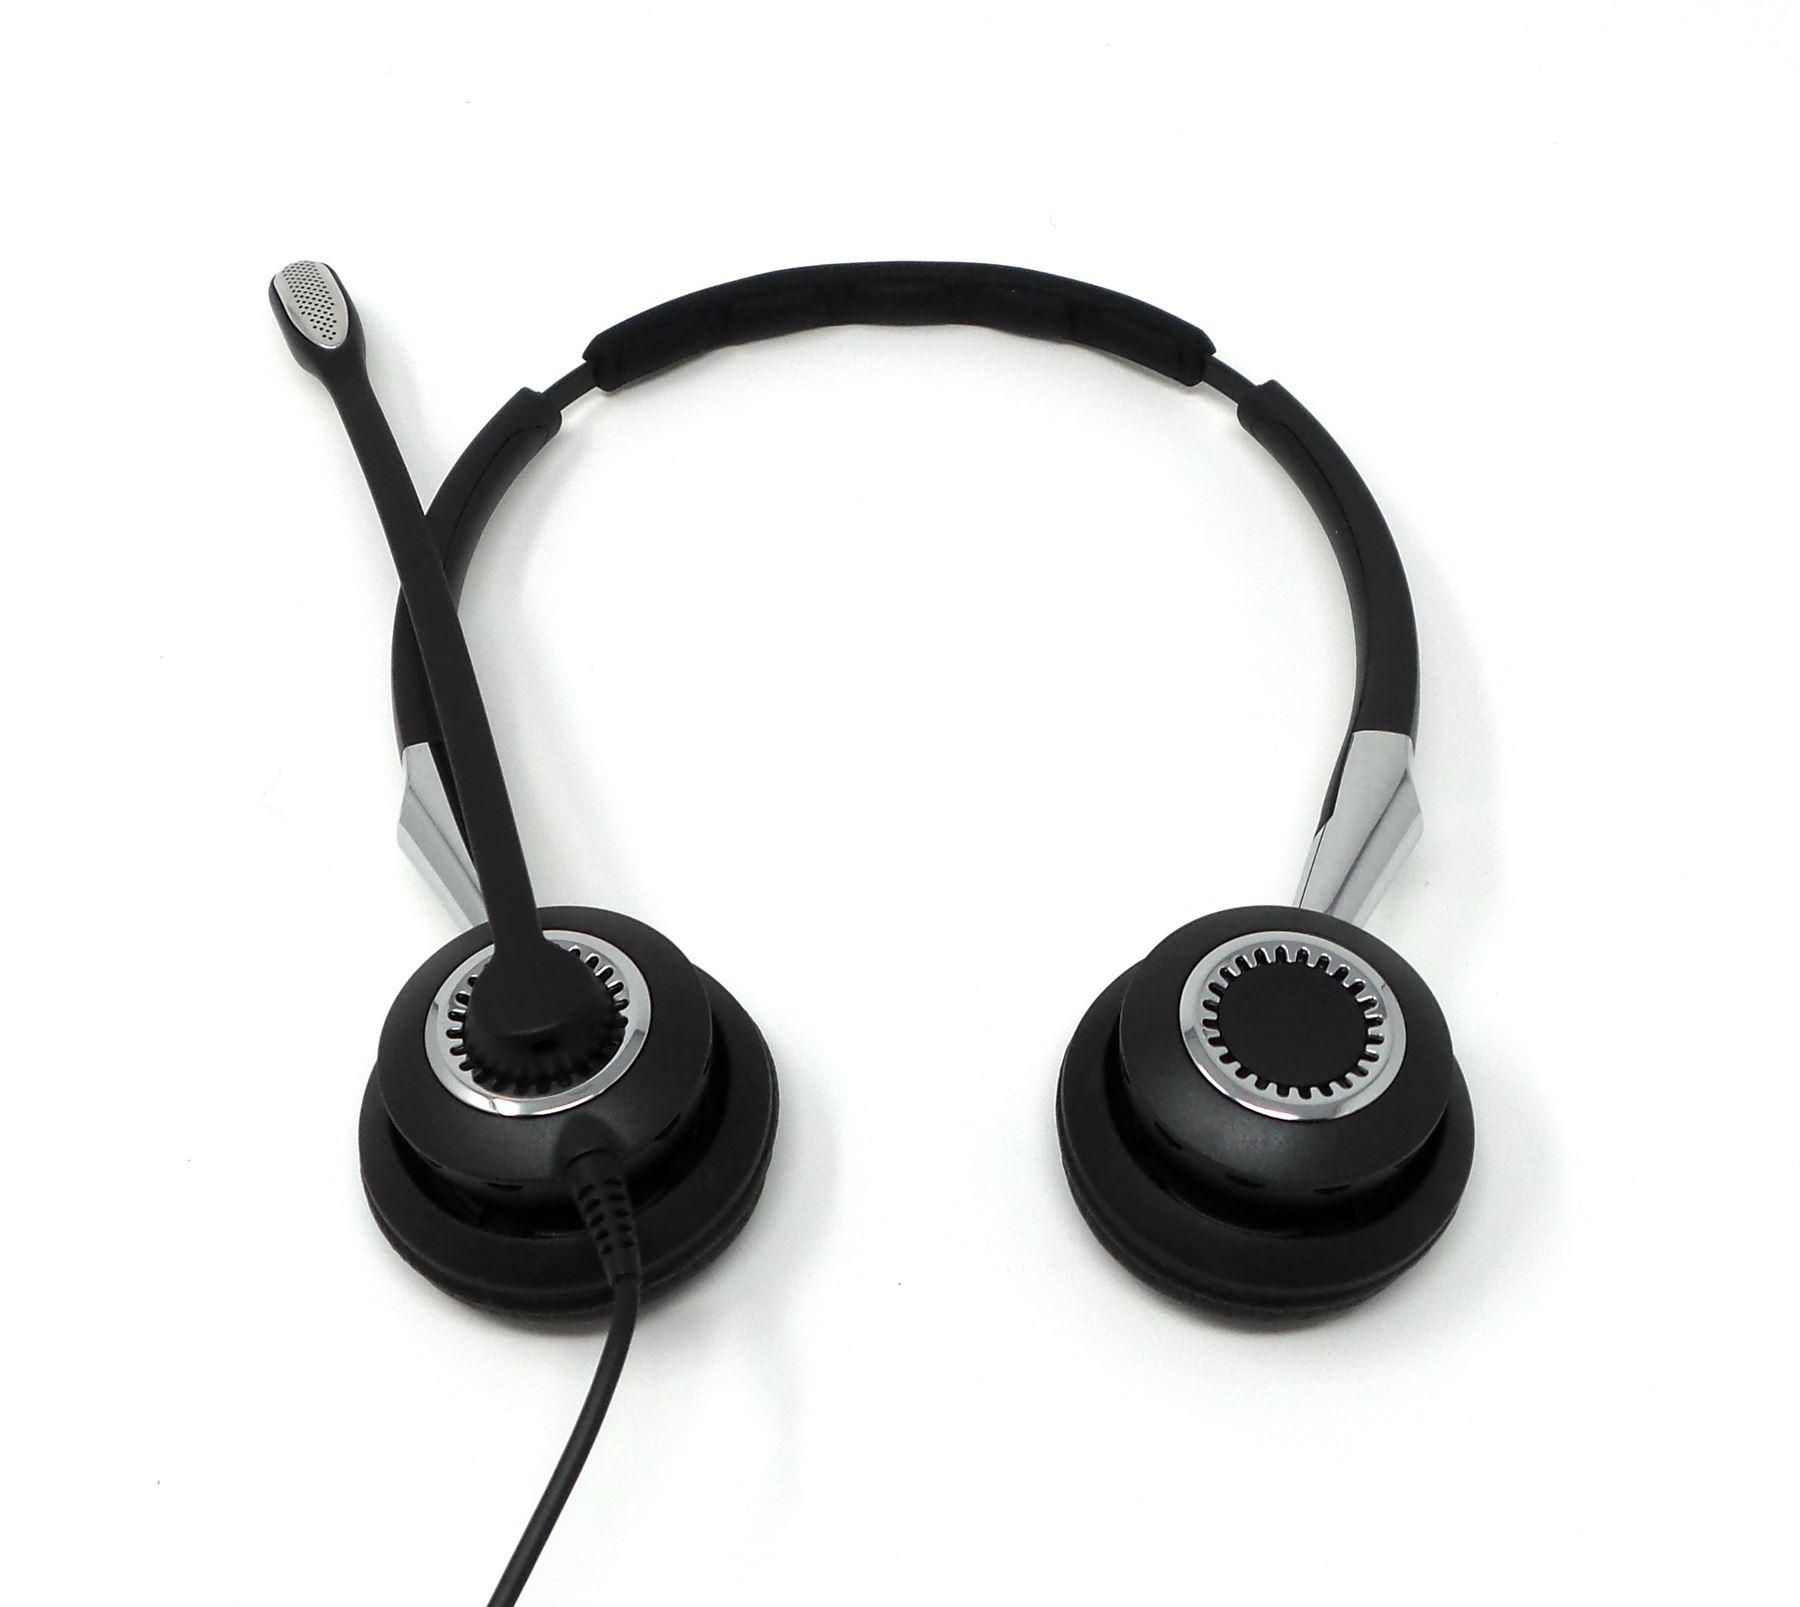 Wired Headset Jabra Biz 2400 Duo Wb Balance: Jabra BIZ 2400 II QD Duo NC Wideband On-Ear Wired Headset